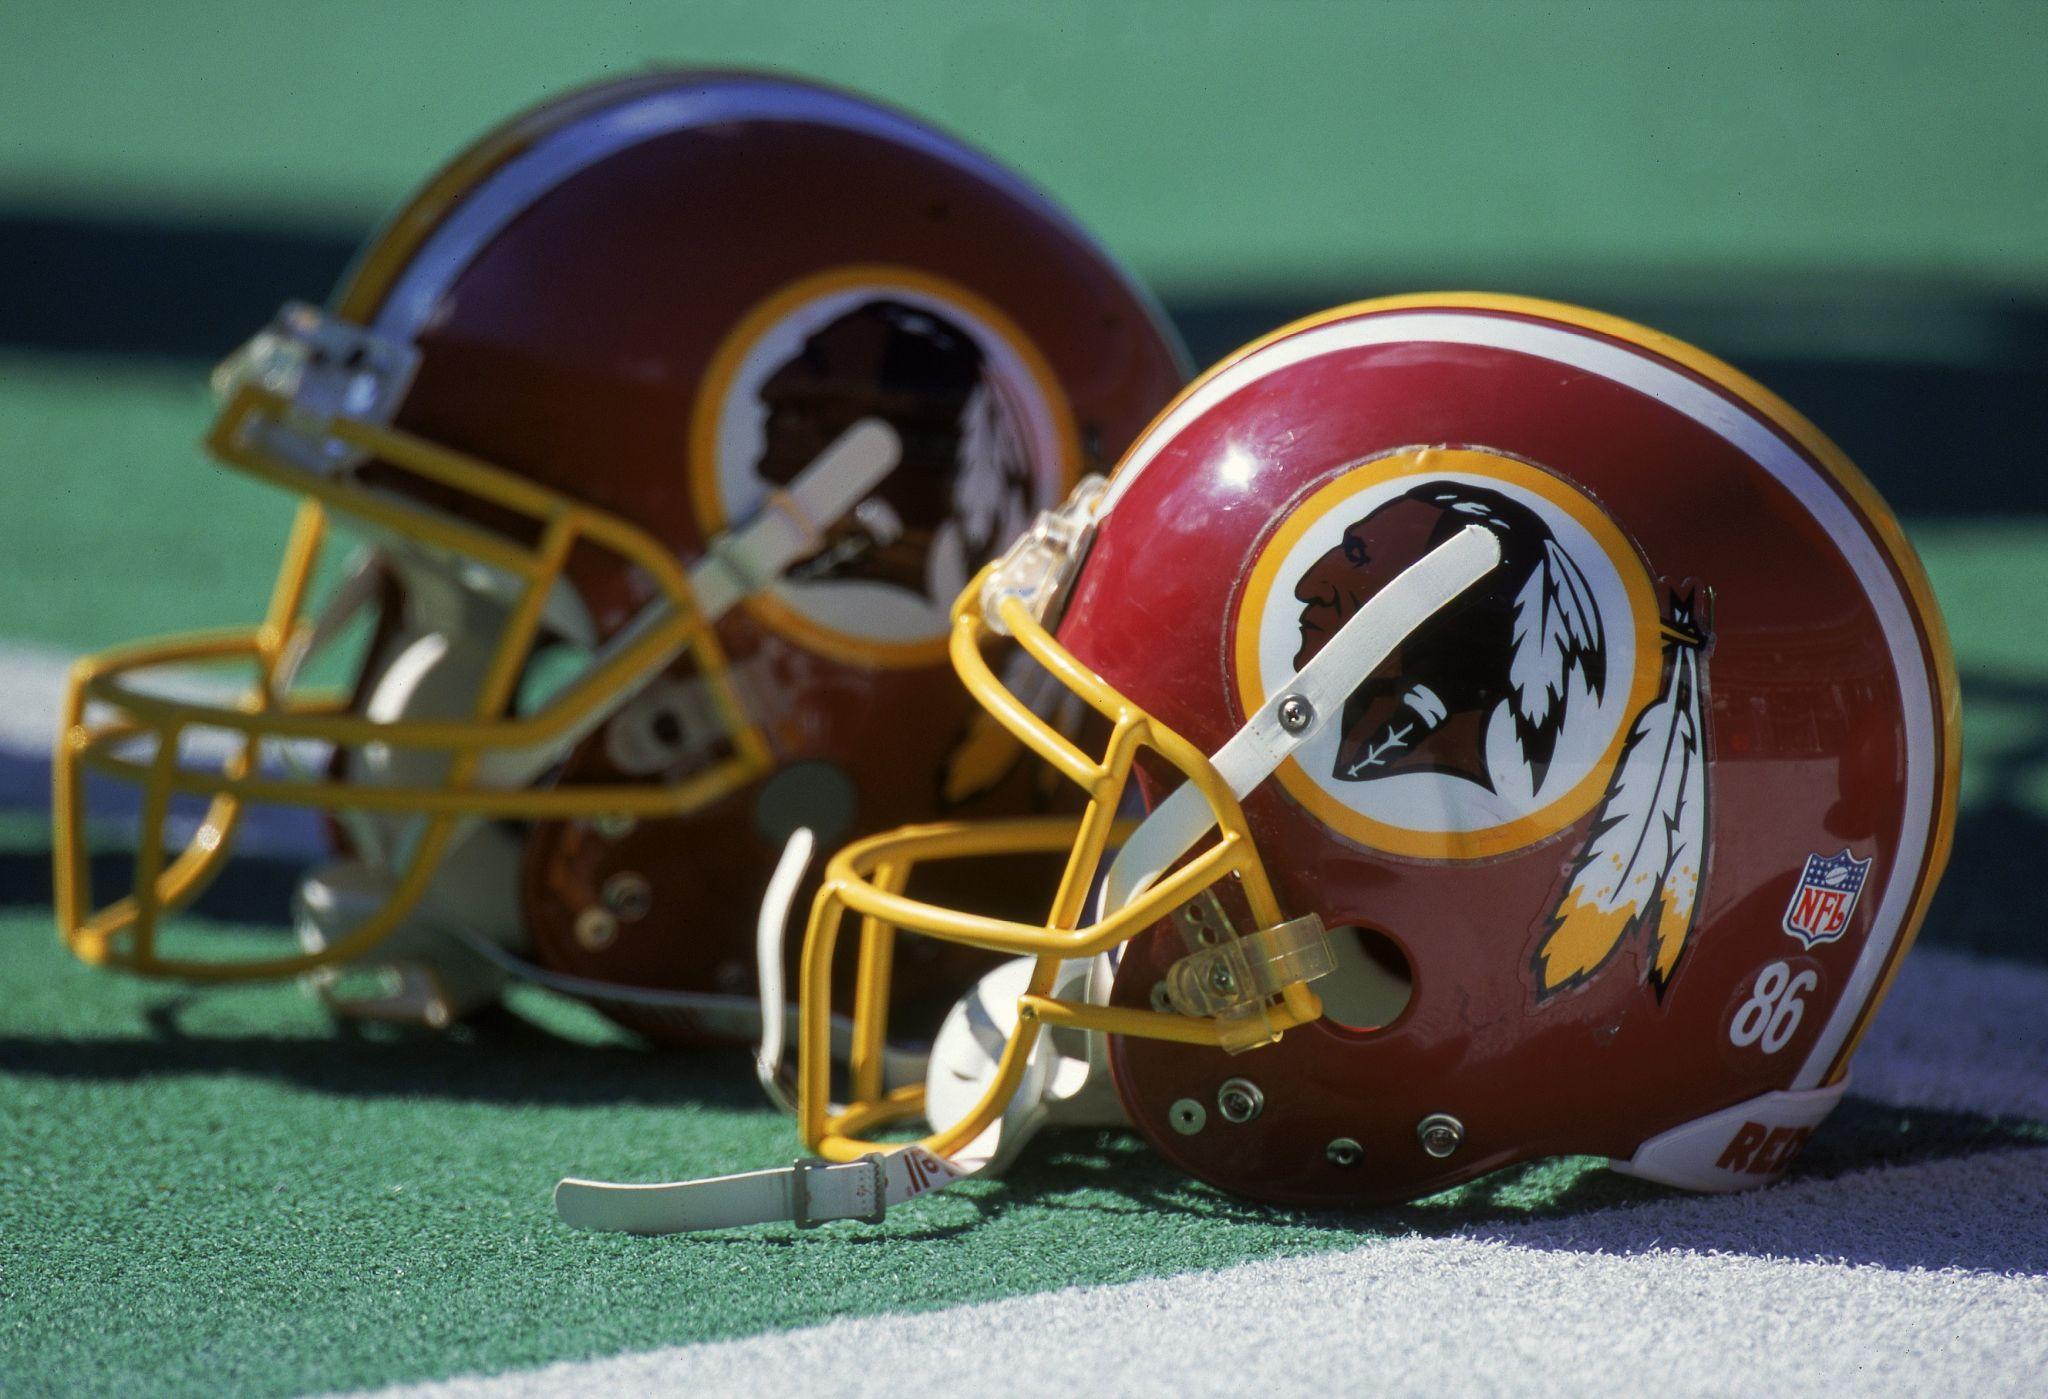 Drew Magary: The Washington football team's name is an eternal disgrace